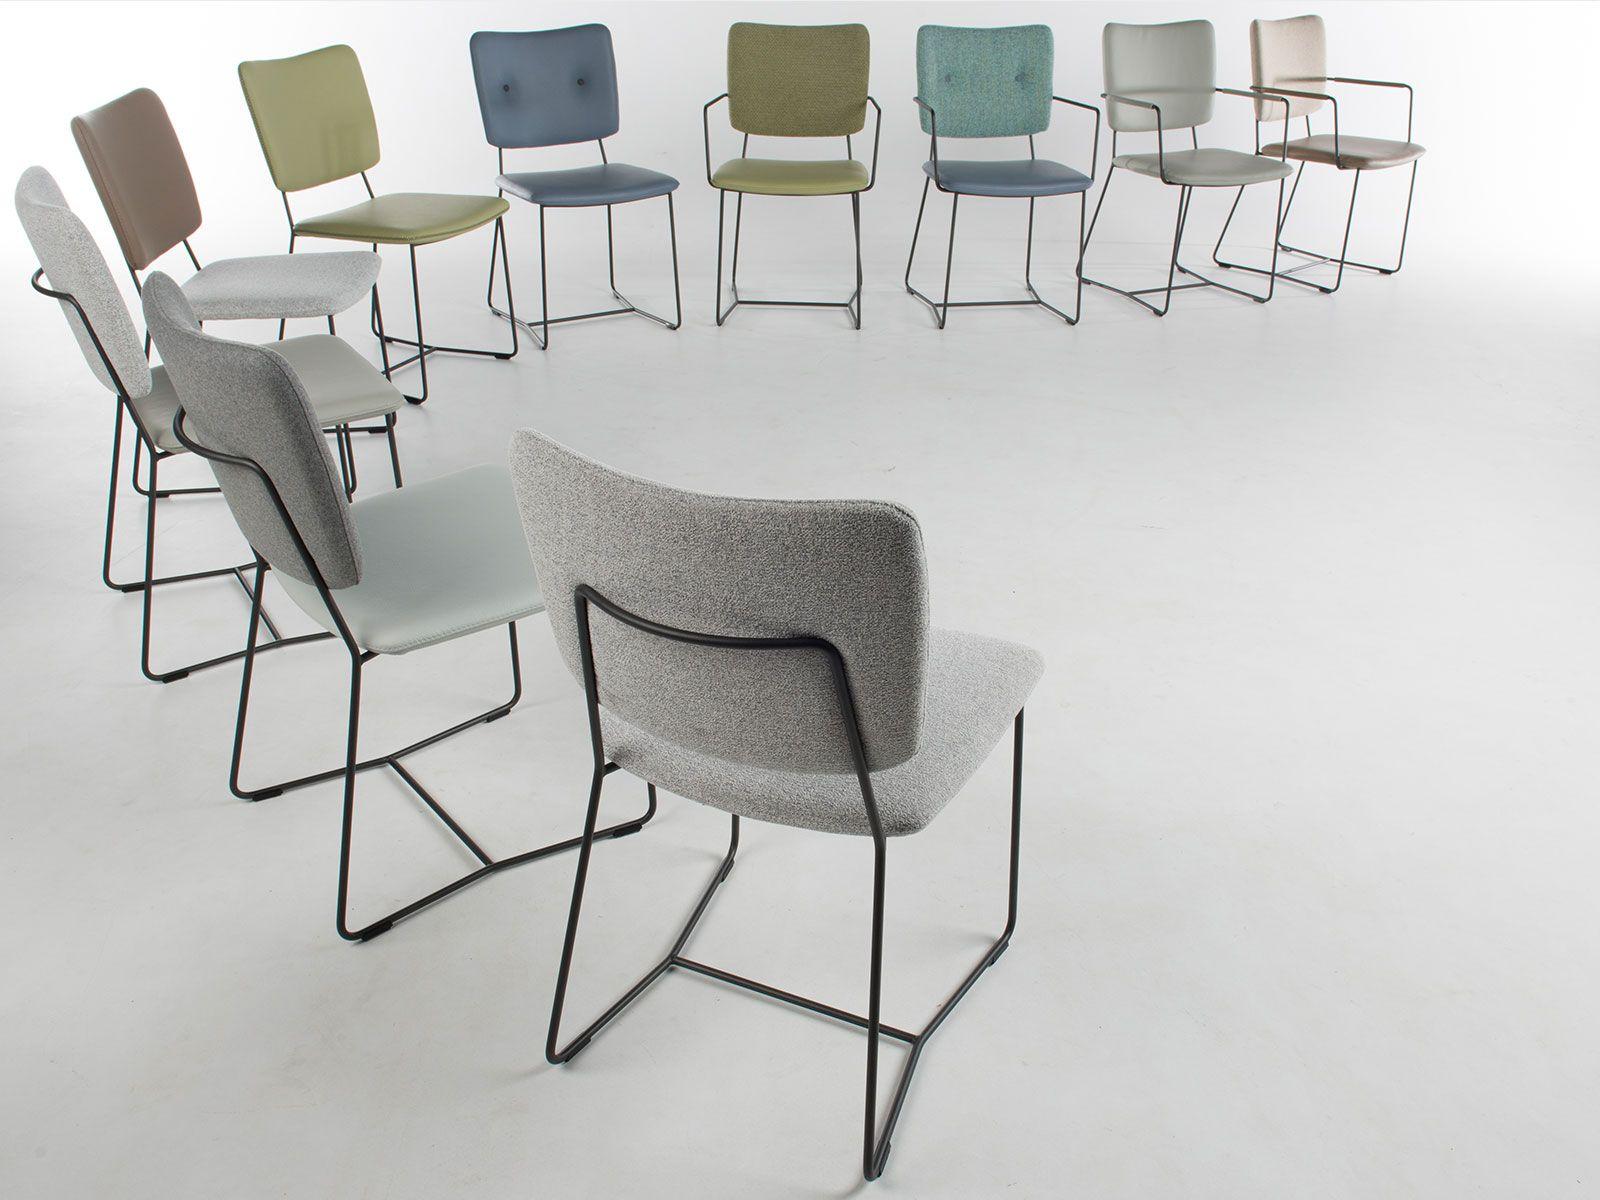 Design Stoelen Bert Plantagie.Bert Plantagie Kiko Stoelen Dining Room Eetkamerstoelen